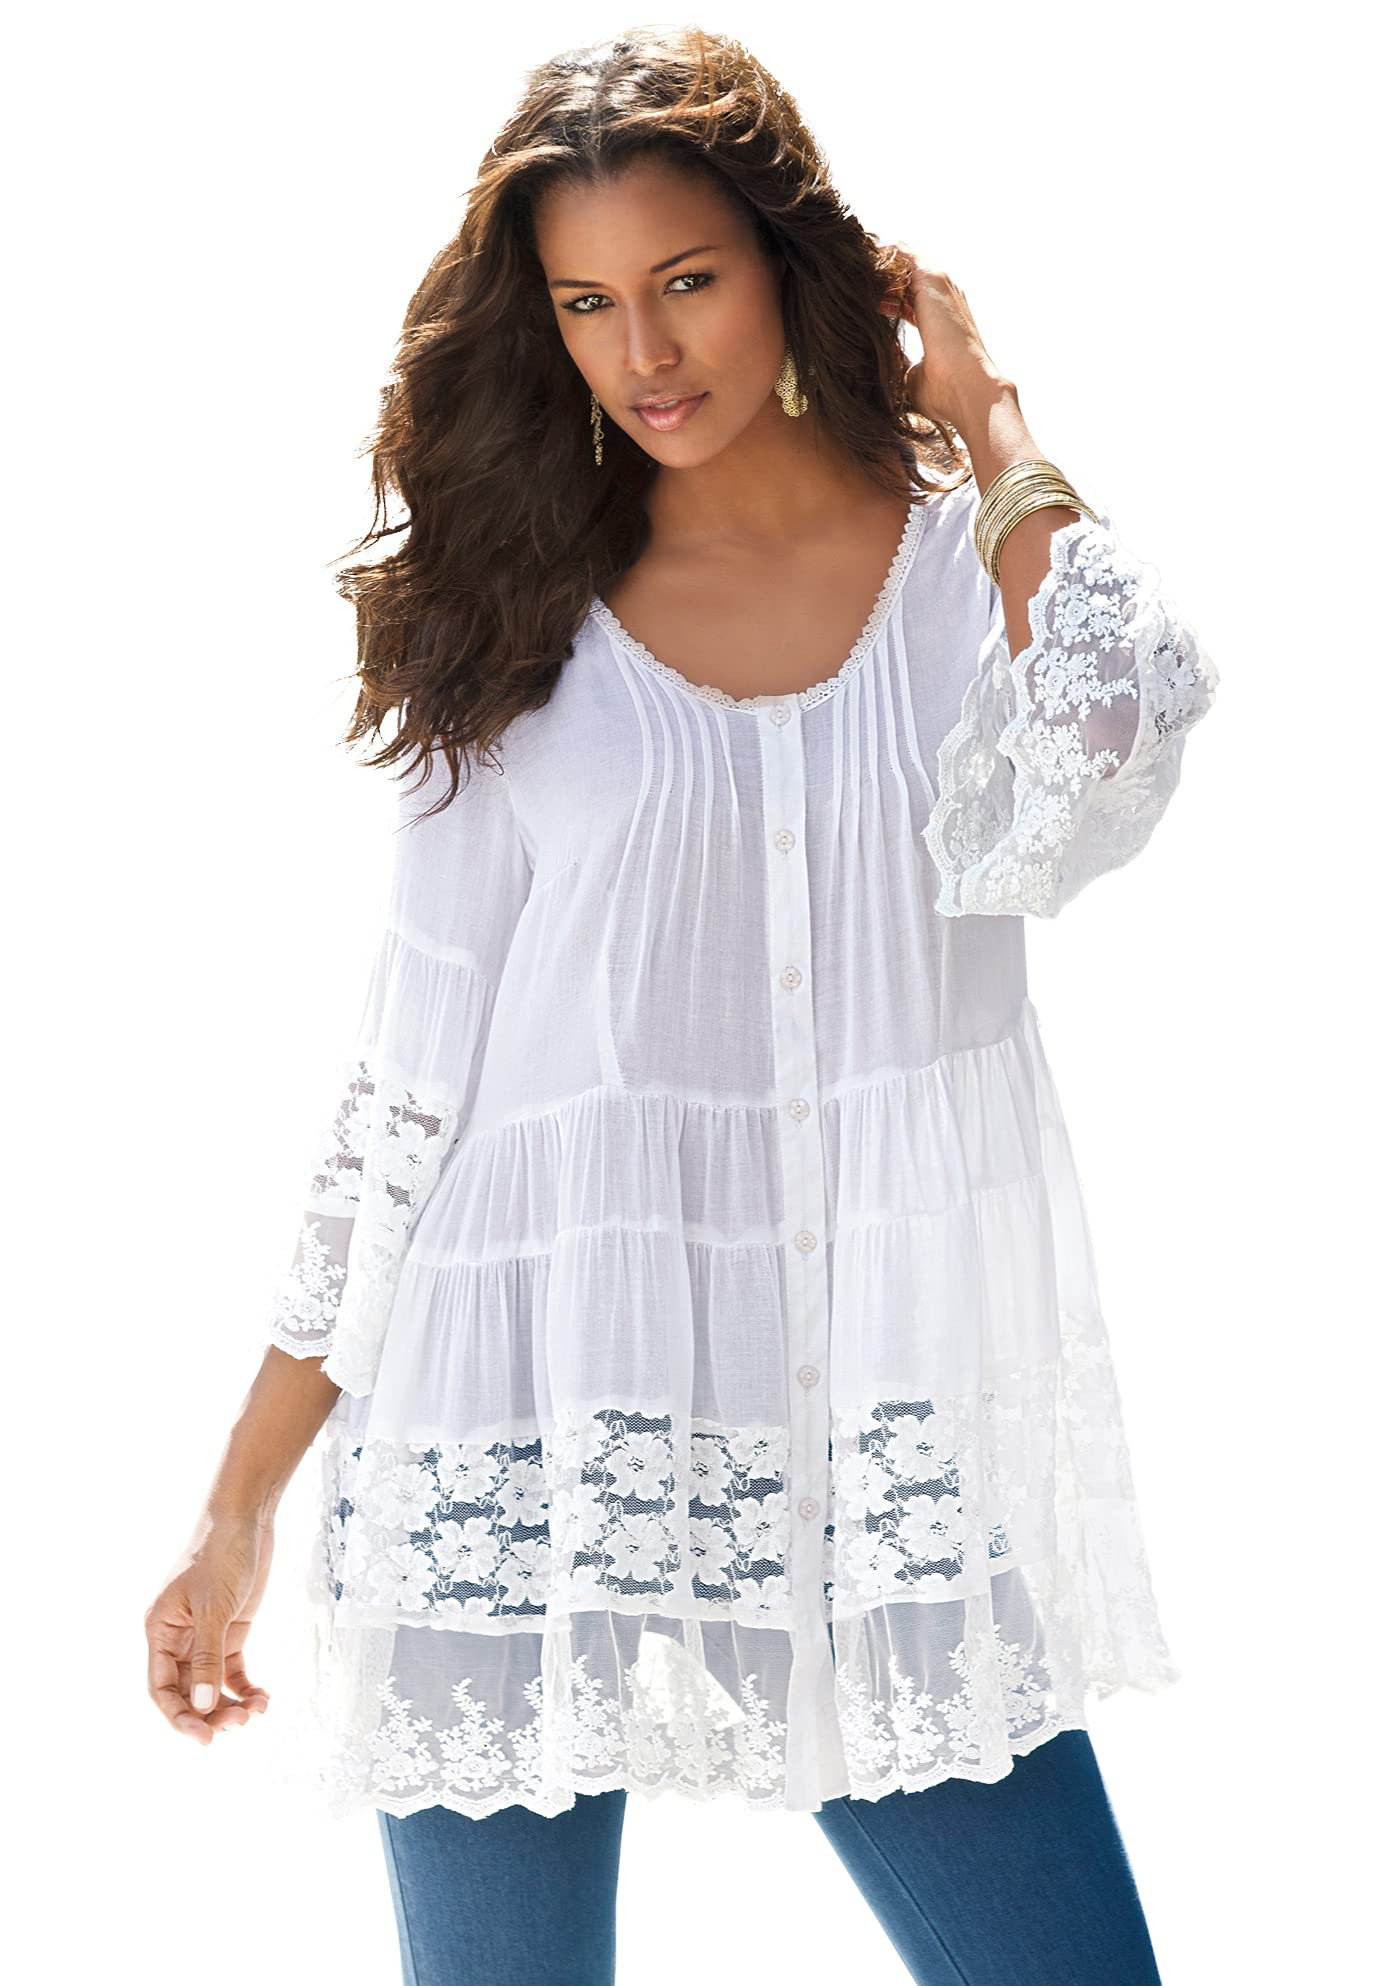 Roaman's Women's Plus Size Illusion Lace Big Shirt Long Shirt Blouse